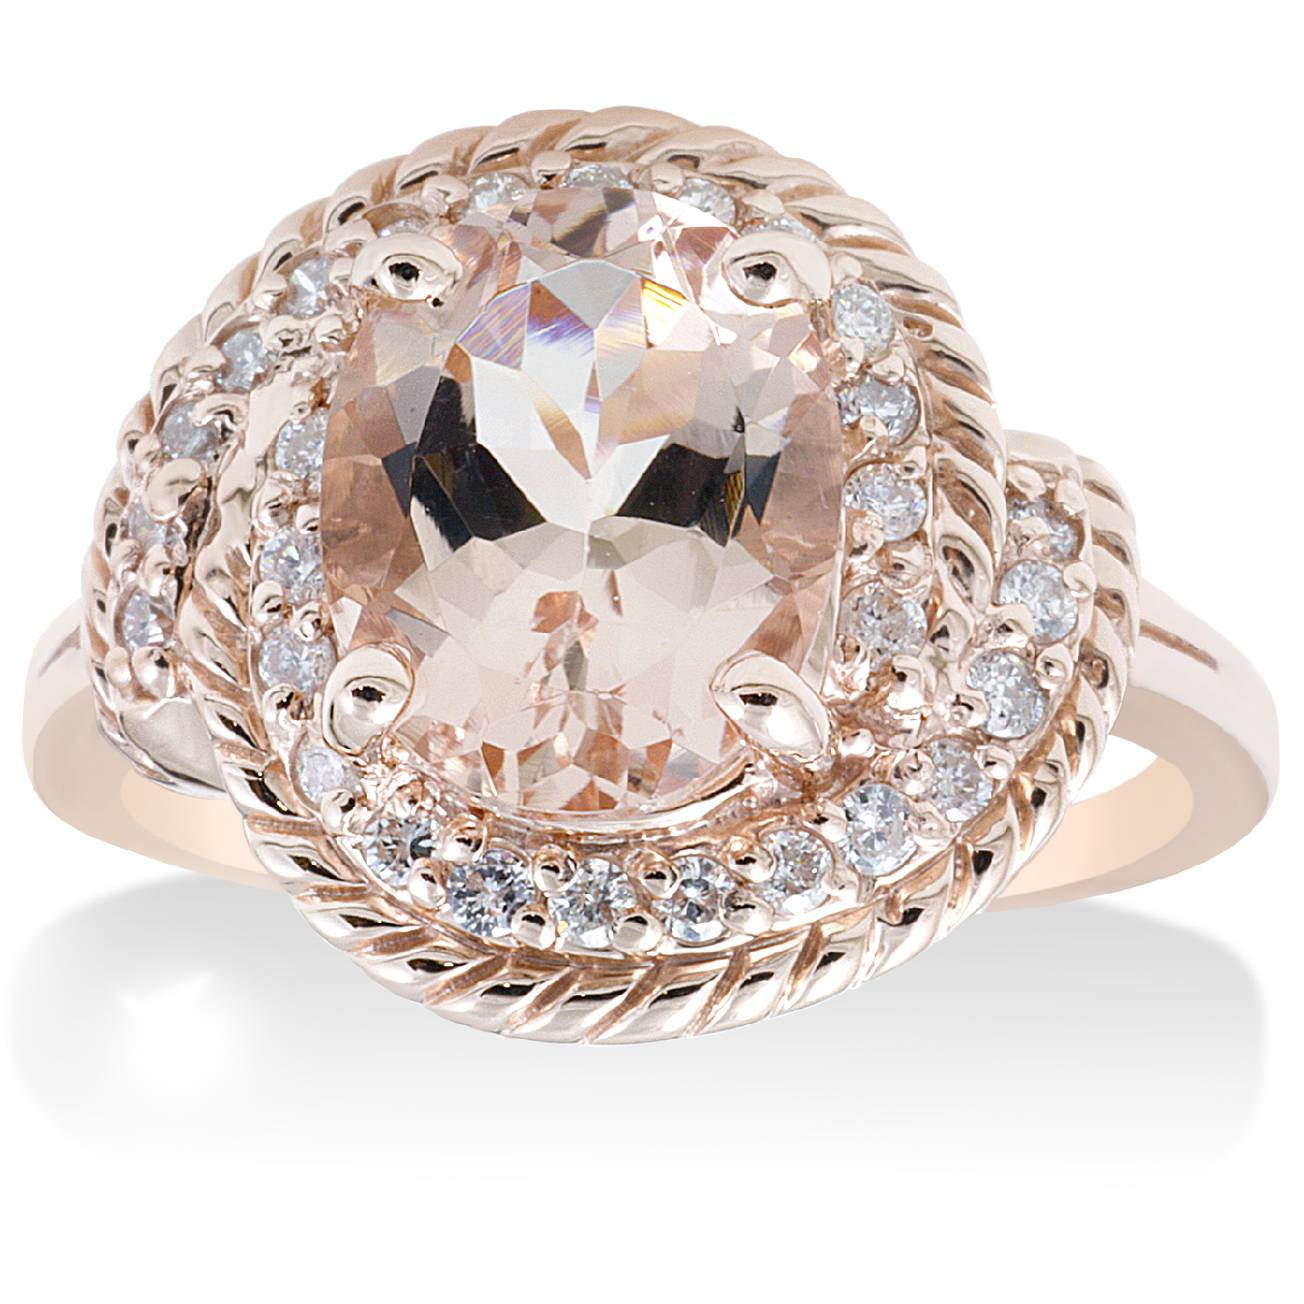 1 3 4ct morganite diamond vintage halo engagement. Black Bedroom Furniture Sets. Home Design Ideas